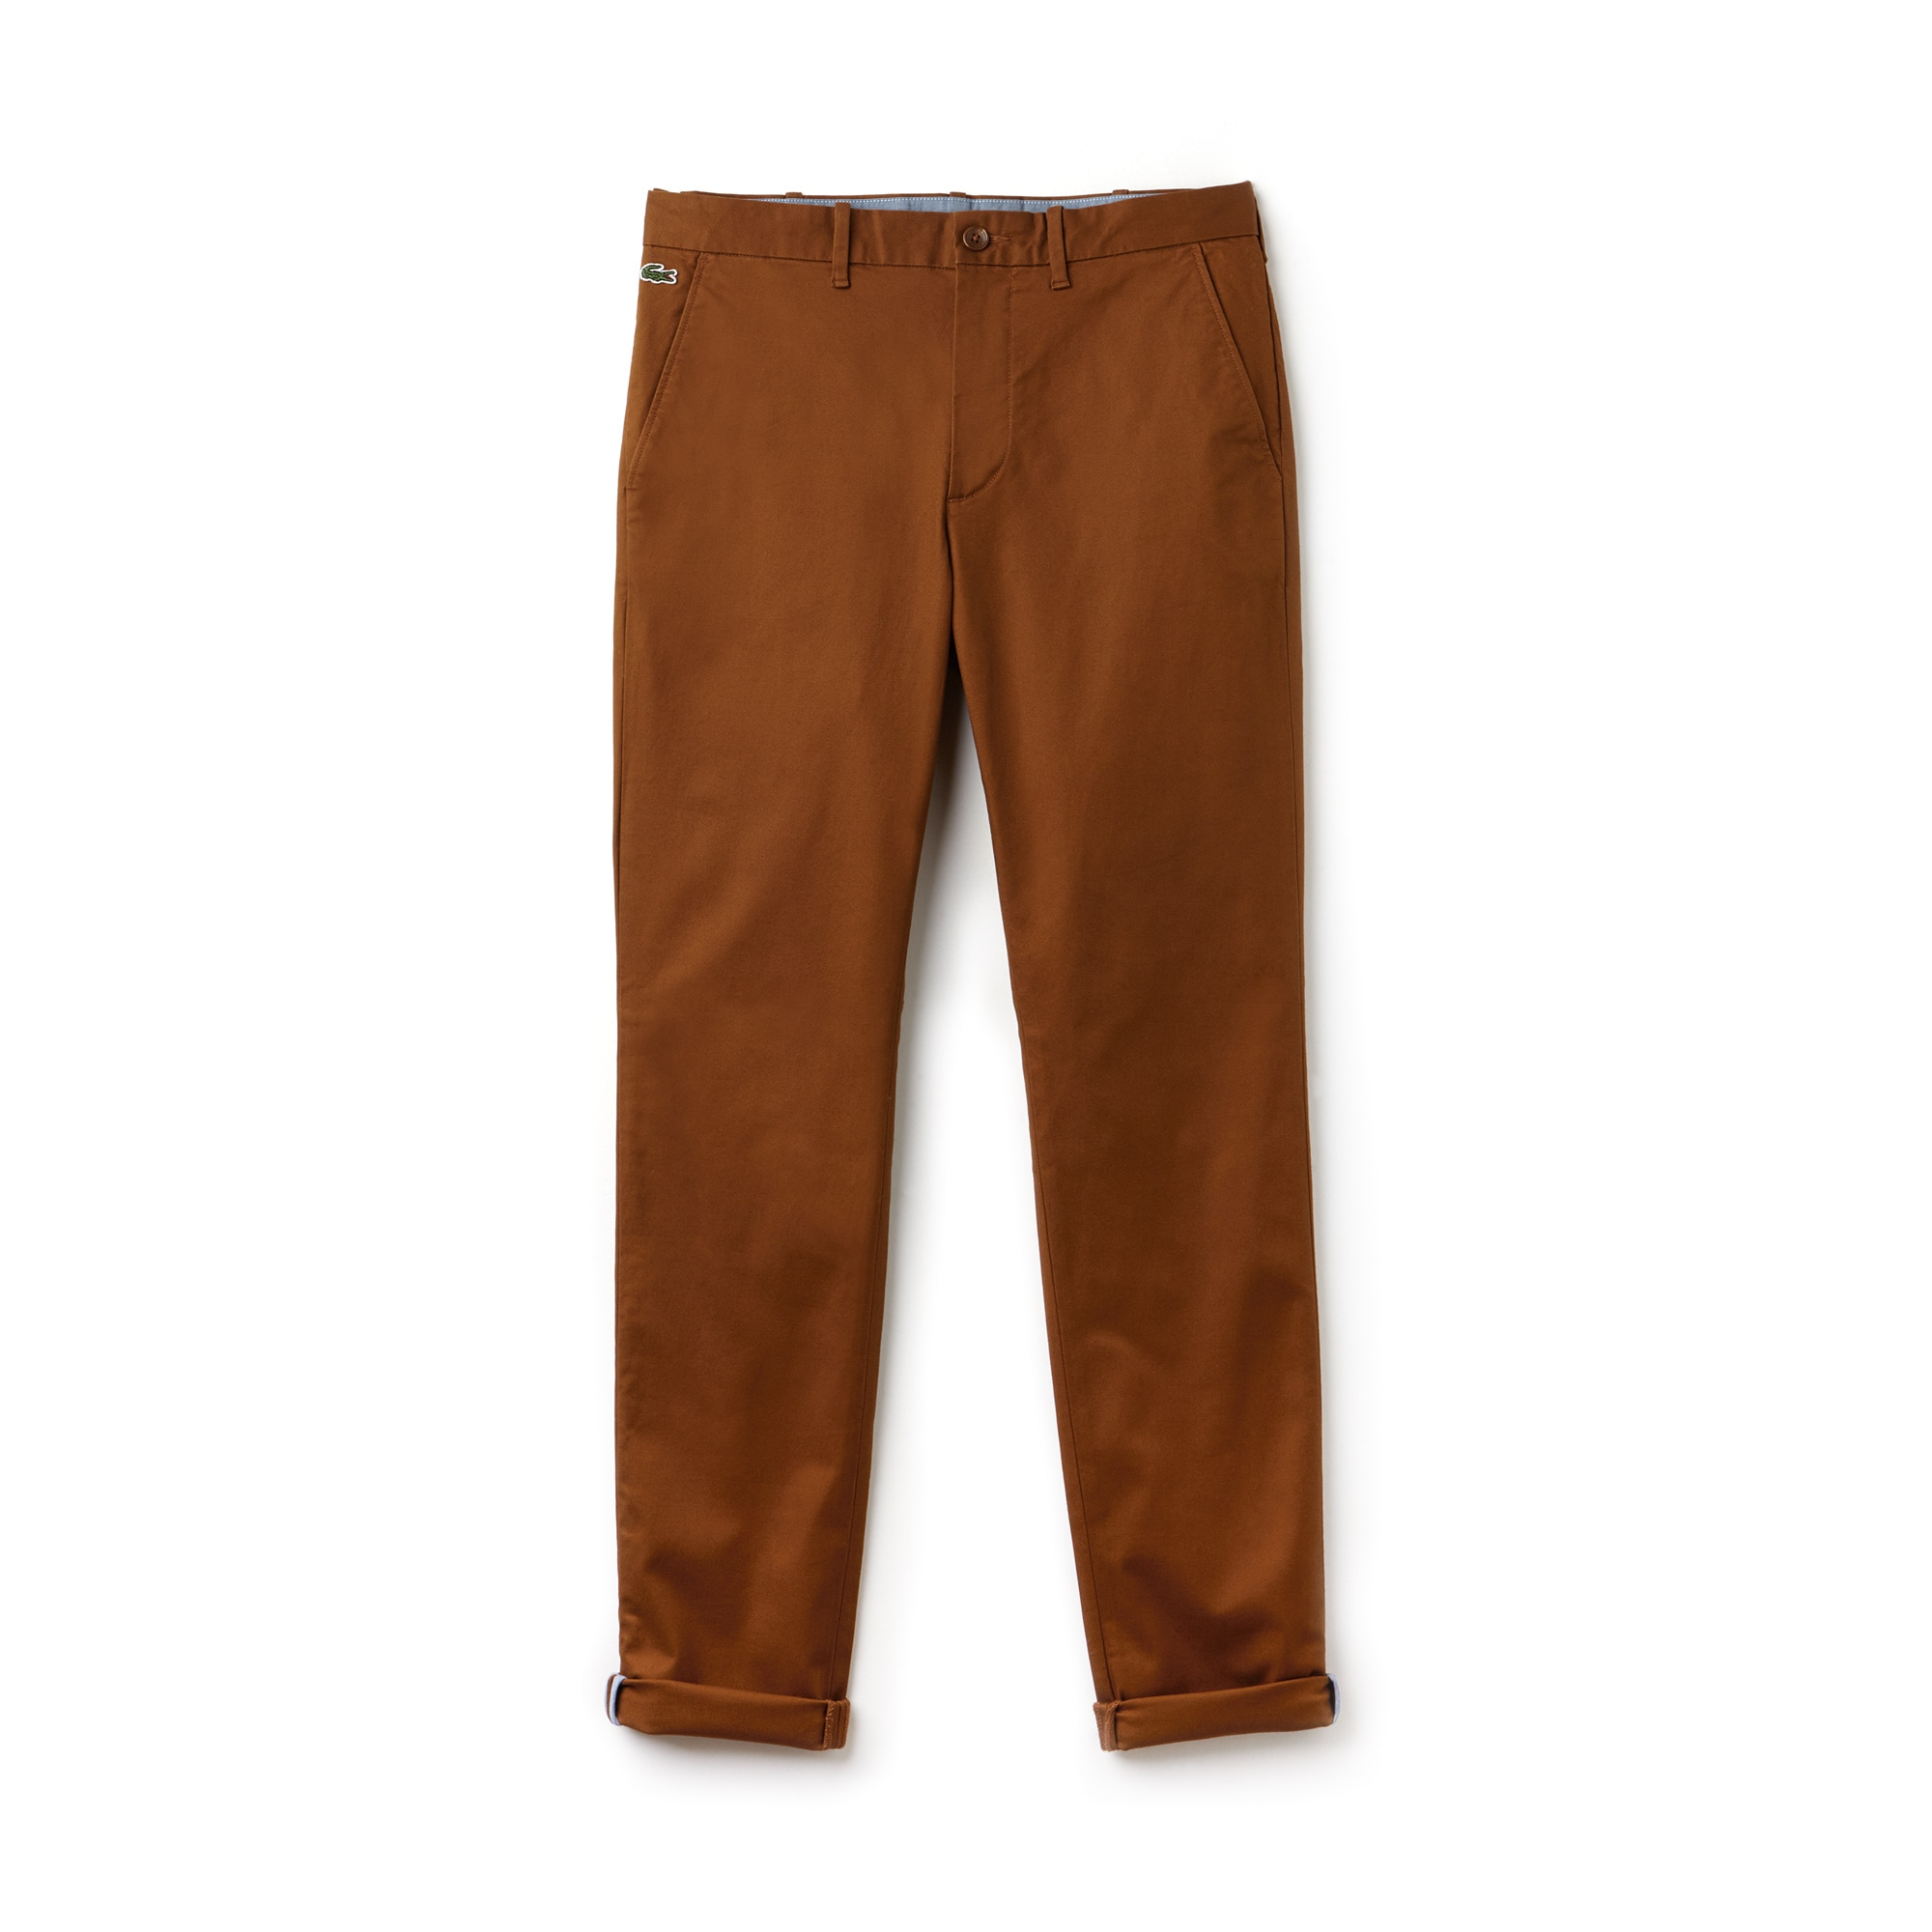 Pantalon chino Lacoste LIVE en twill stretch uni